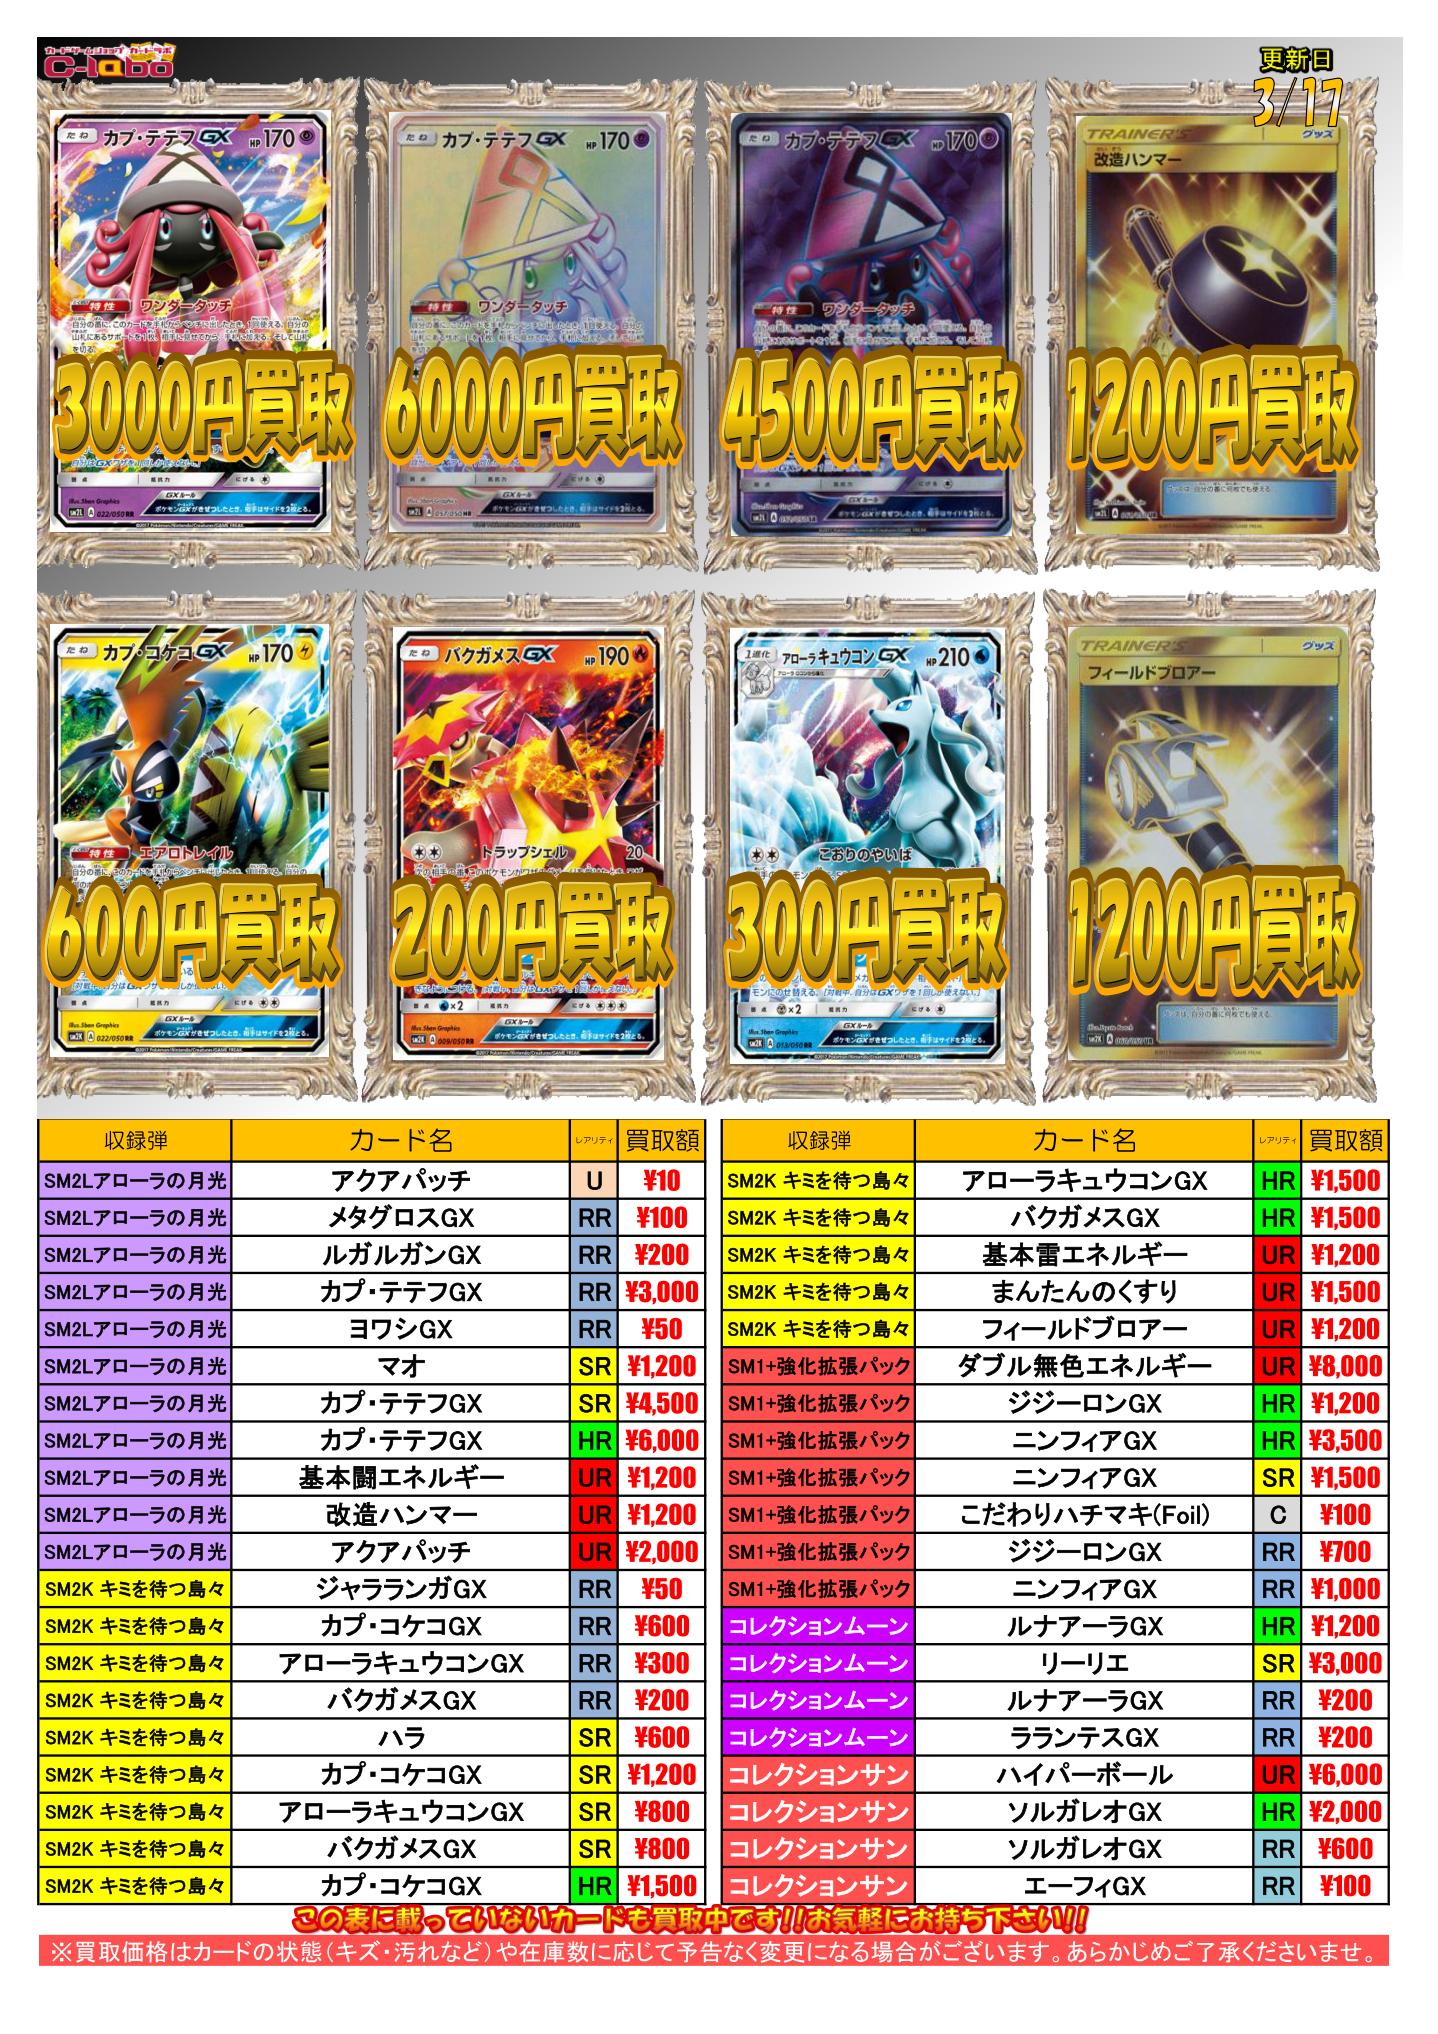 ☆SM~最新弾買取表☆